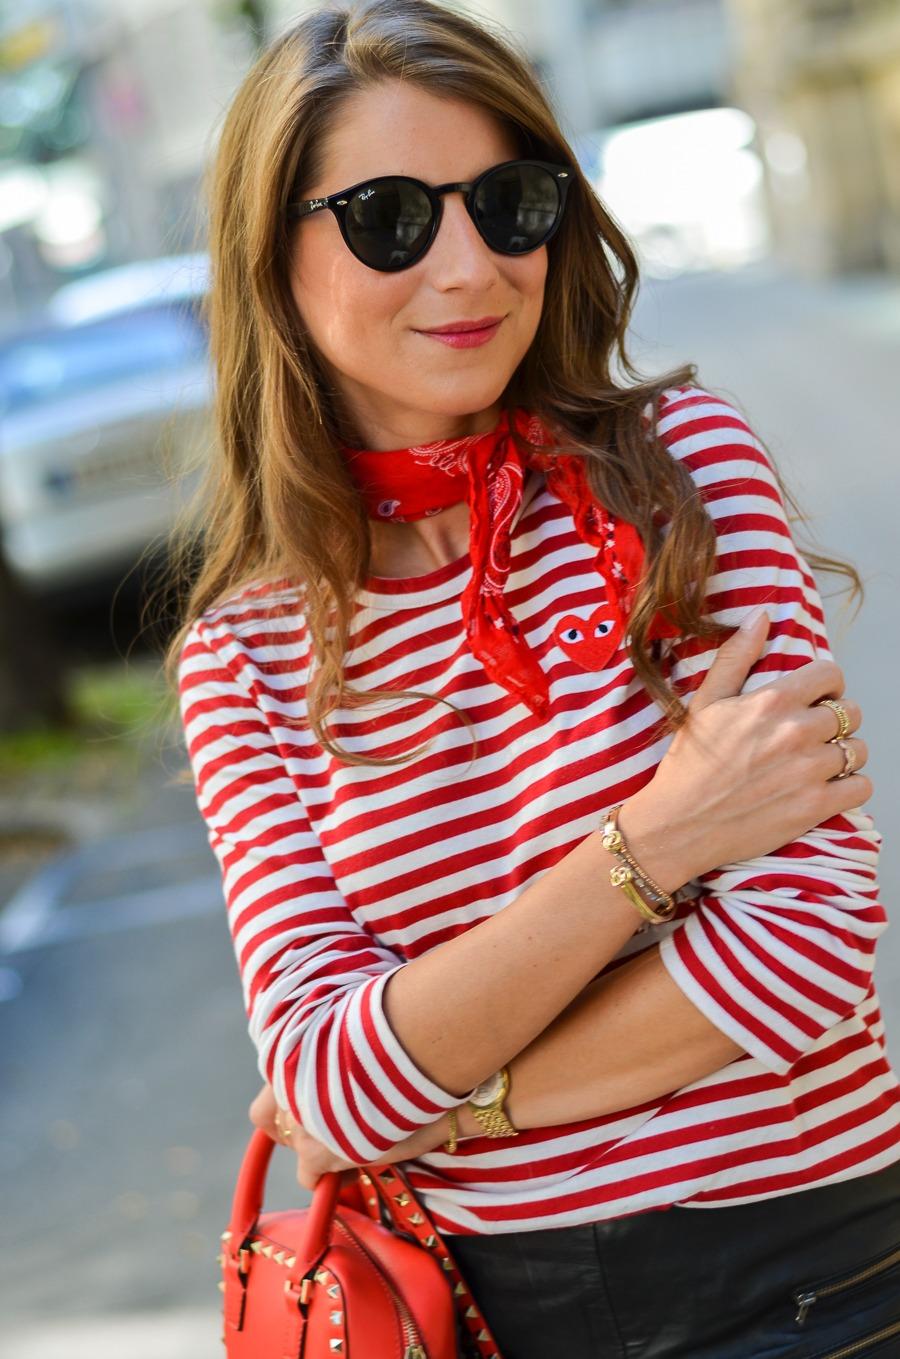 comme des garcons striped shirt longsleeve & bandana outfit